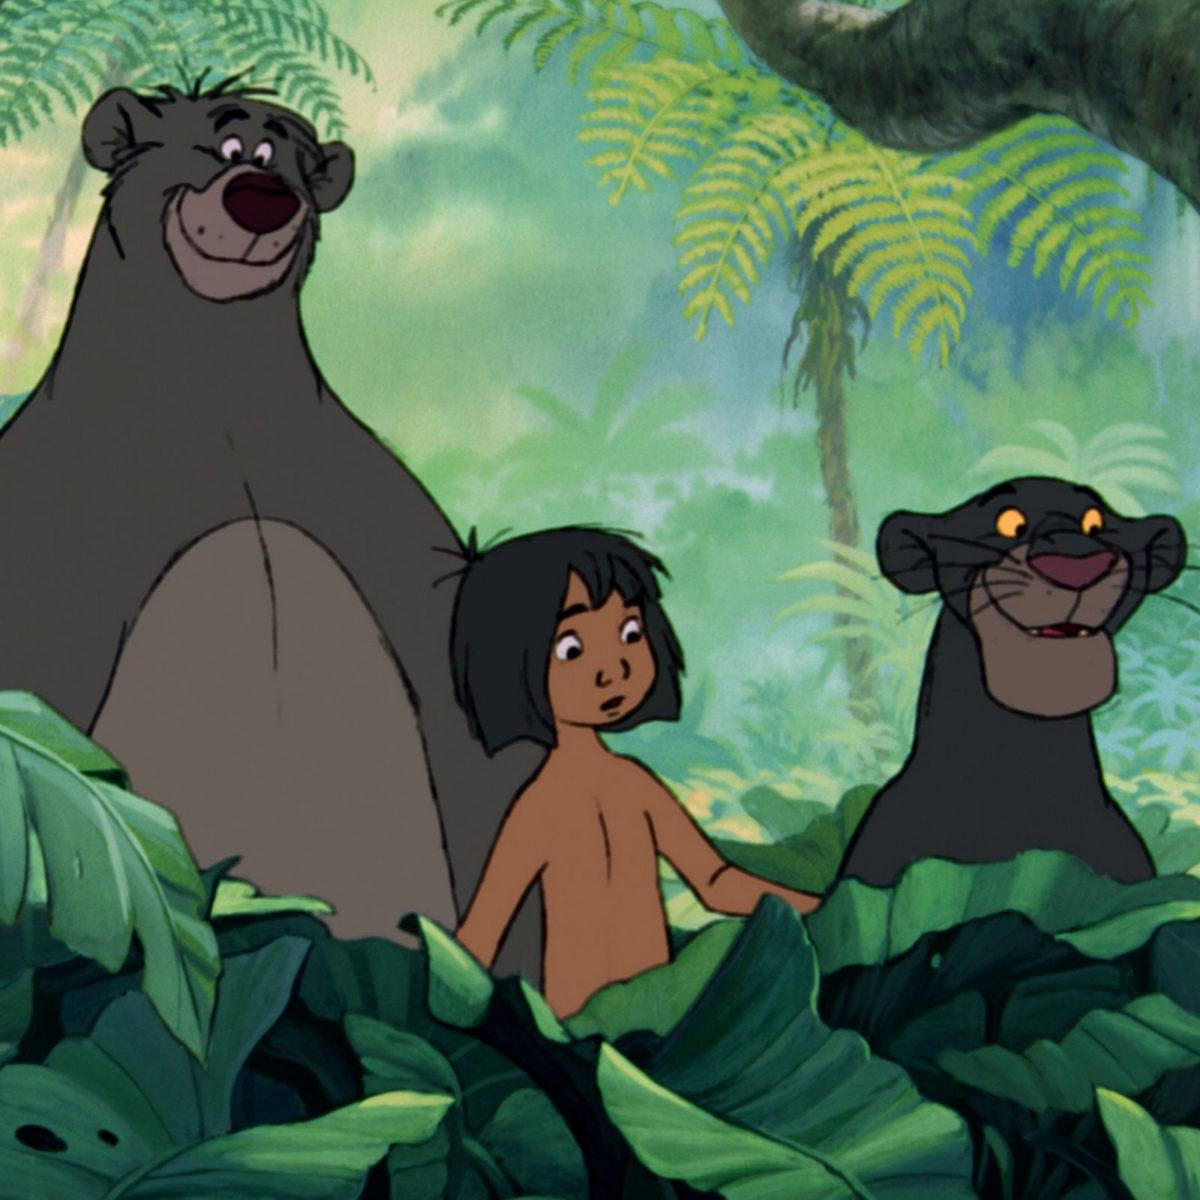 oso balo: bagheera y baloo